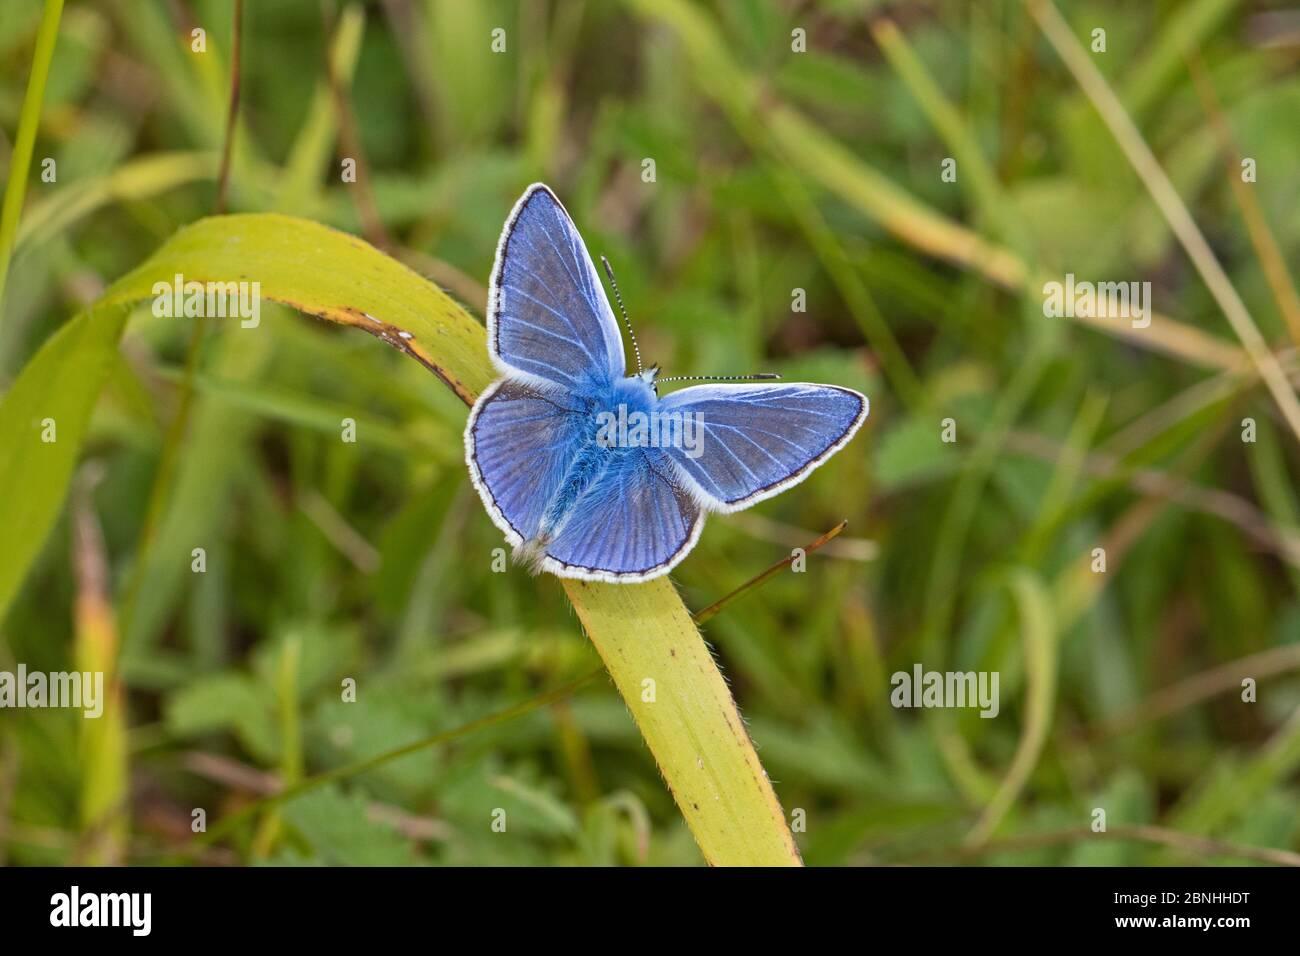 Mariposa azul común (Polyommatus icarus) Sutcliffe Parque Reserva Natural, Eltham, Londres, Reino Unido. Julio. Foto de stock